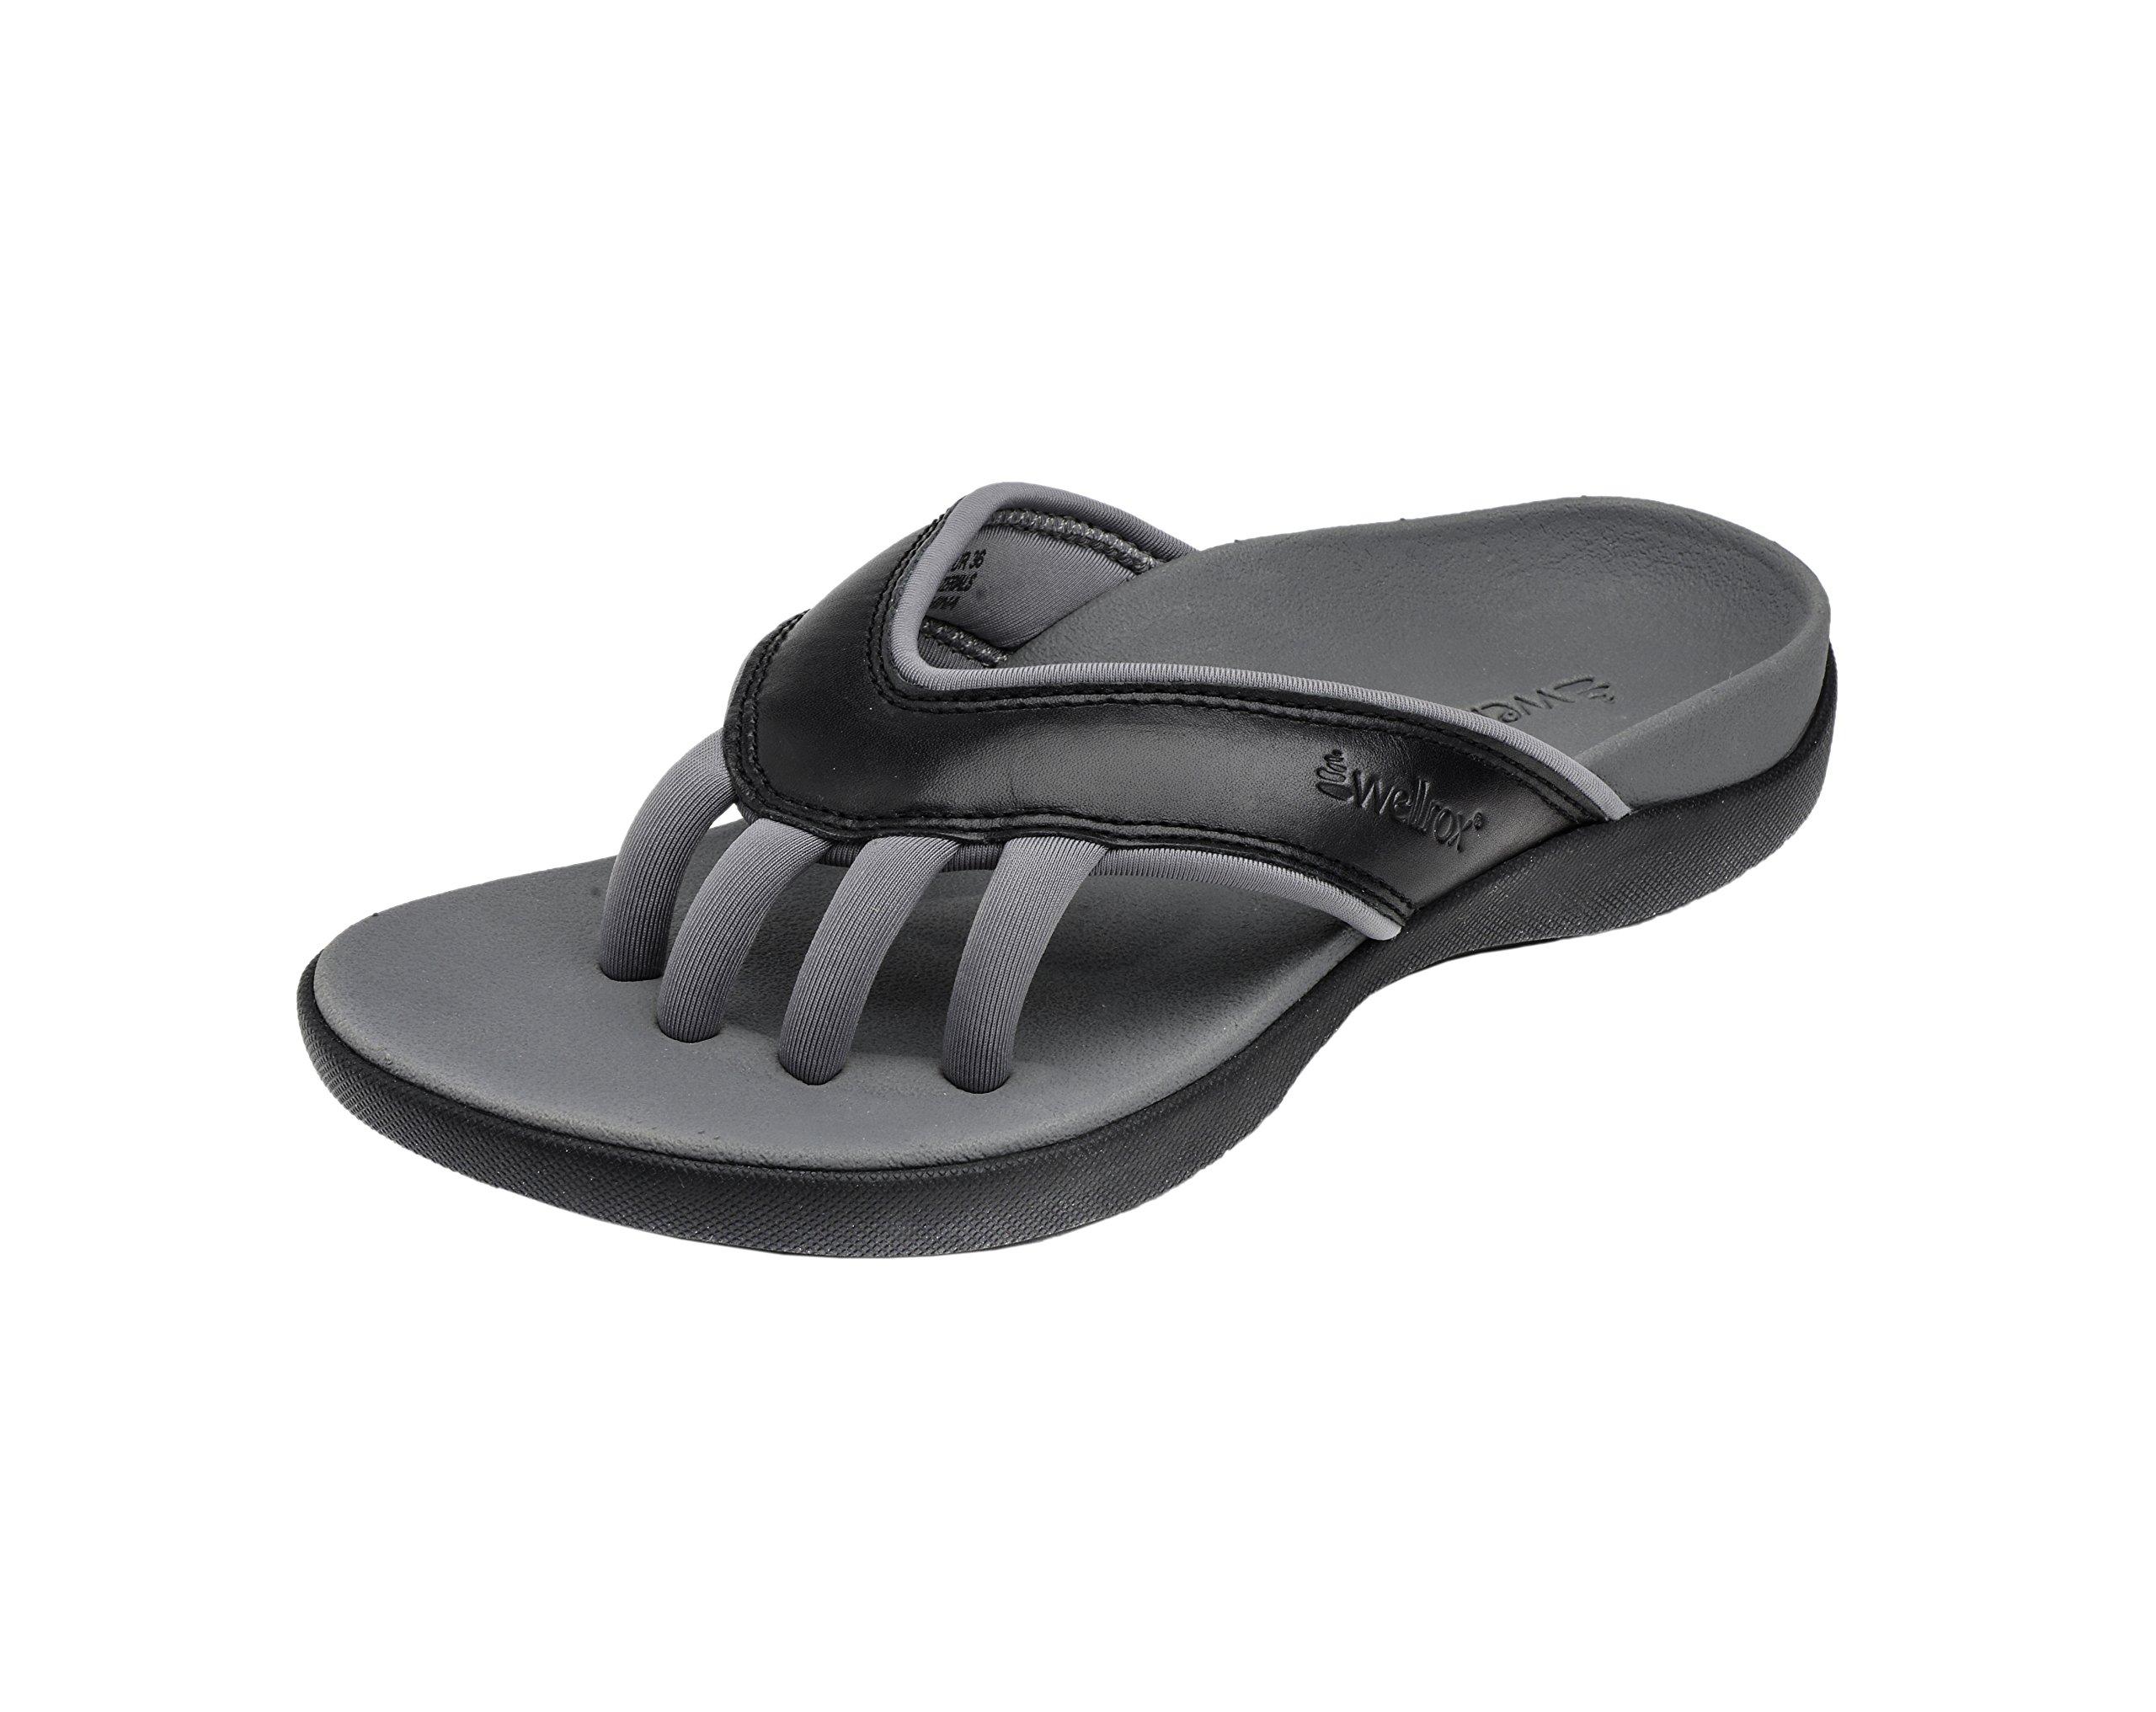 Wellrox Women's Evo-Cloud Black Casual Sandal 11